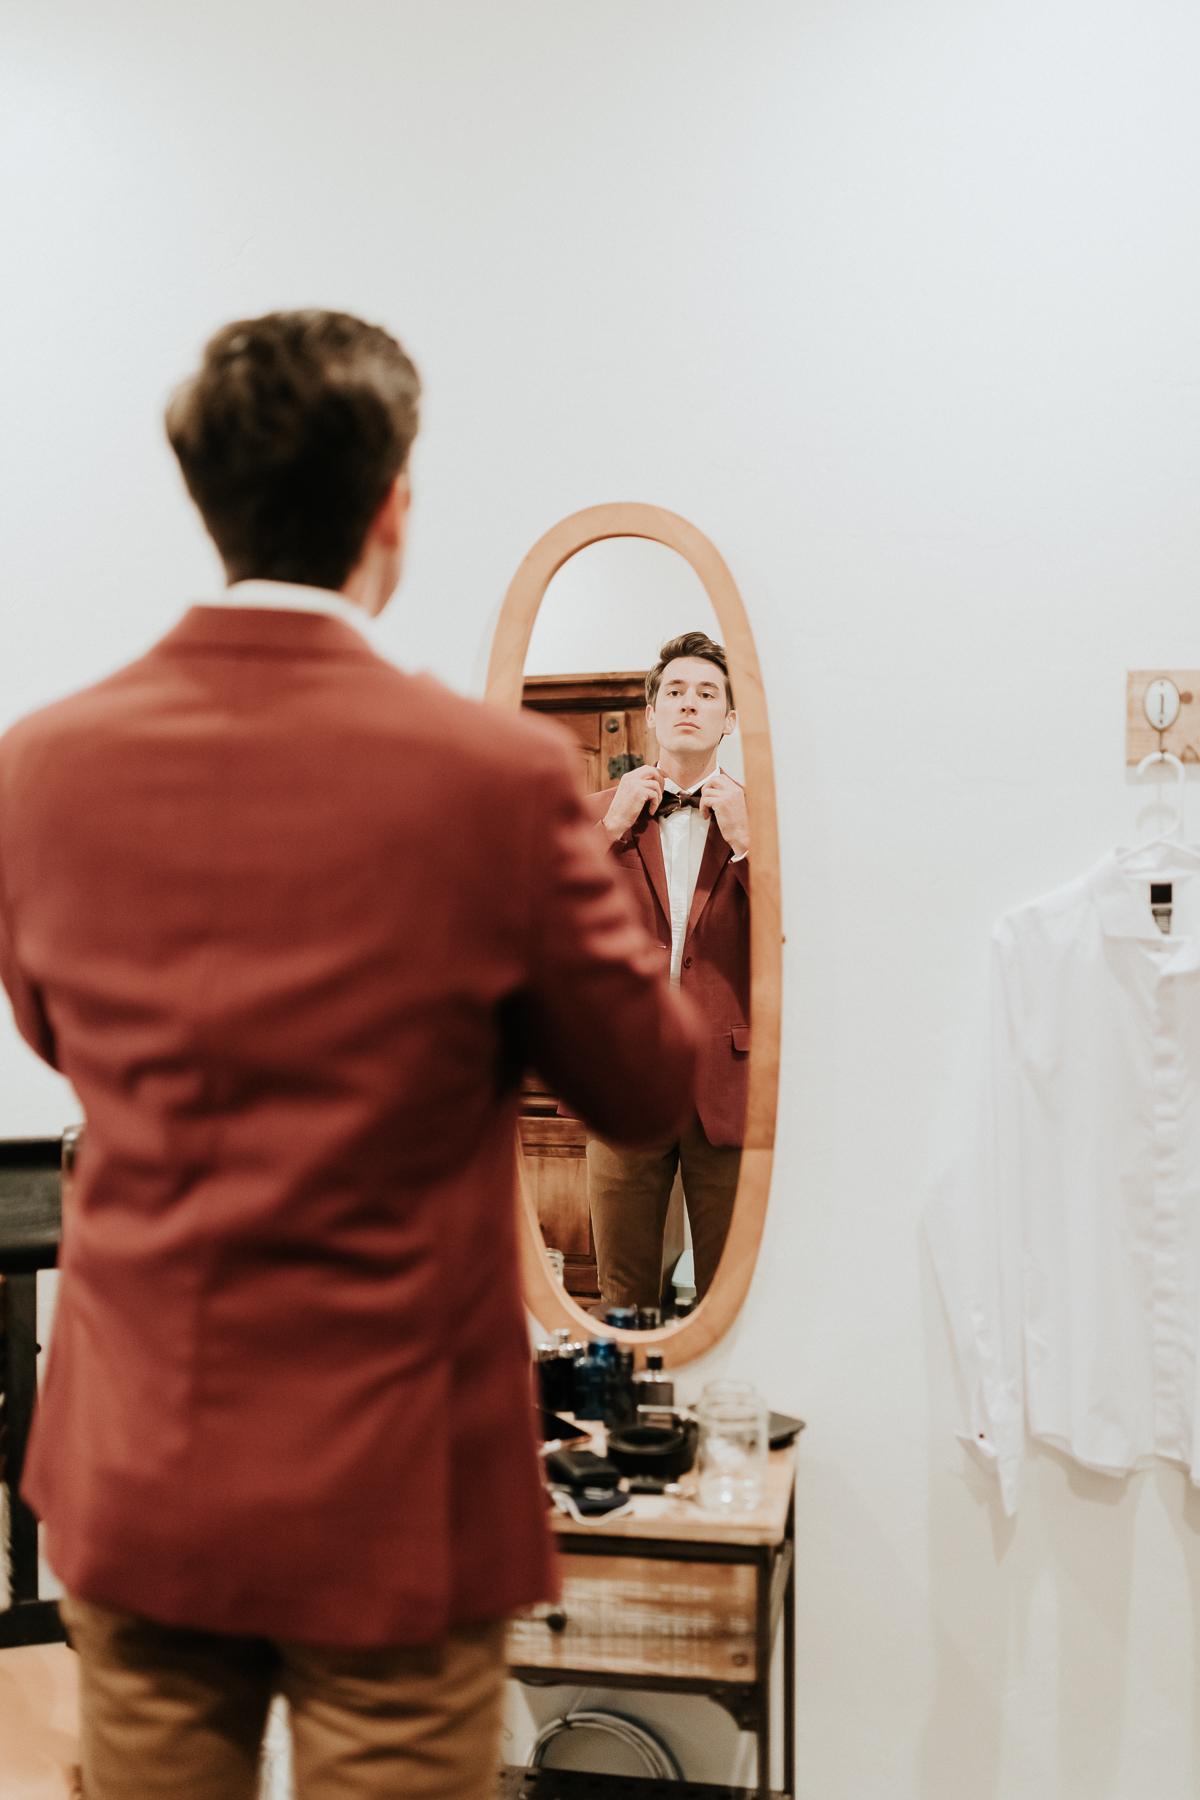 Megan Claire Photography | Arizona Wedding Photographer.  Rustic Glam Backyard Wedding. Getting ready photos